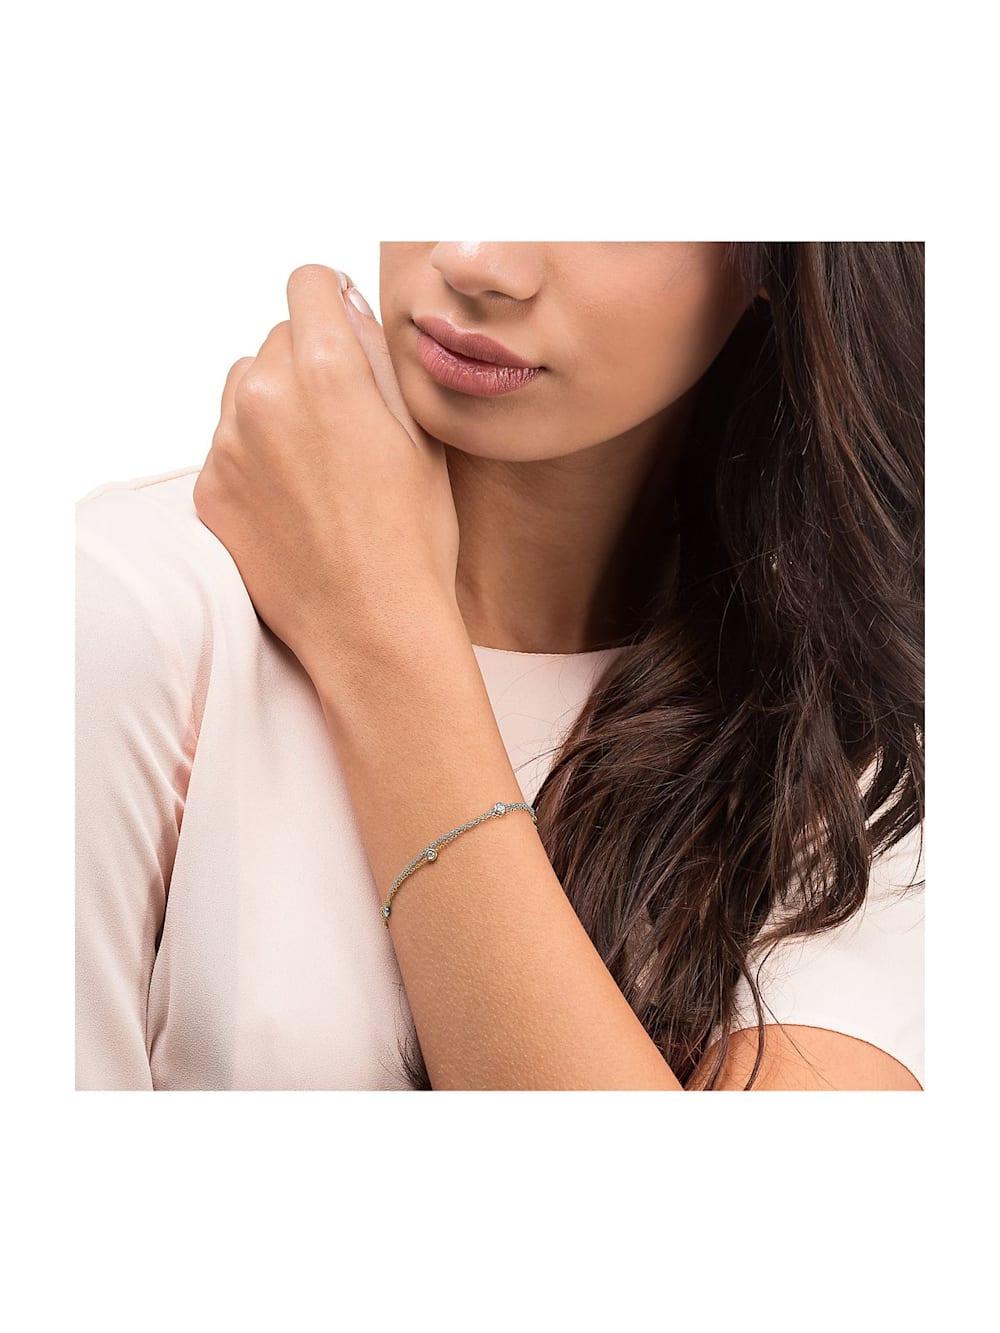 CHRIST Diamonds CHRIST Diamonds Damen Armband 585er Weißgold, 585er Gelbgold 5 Diamant | Klingel